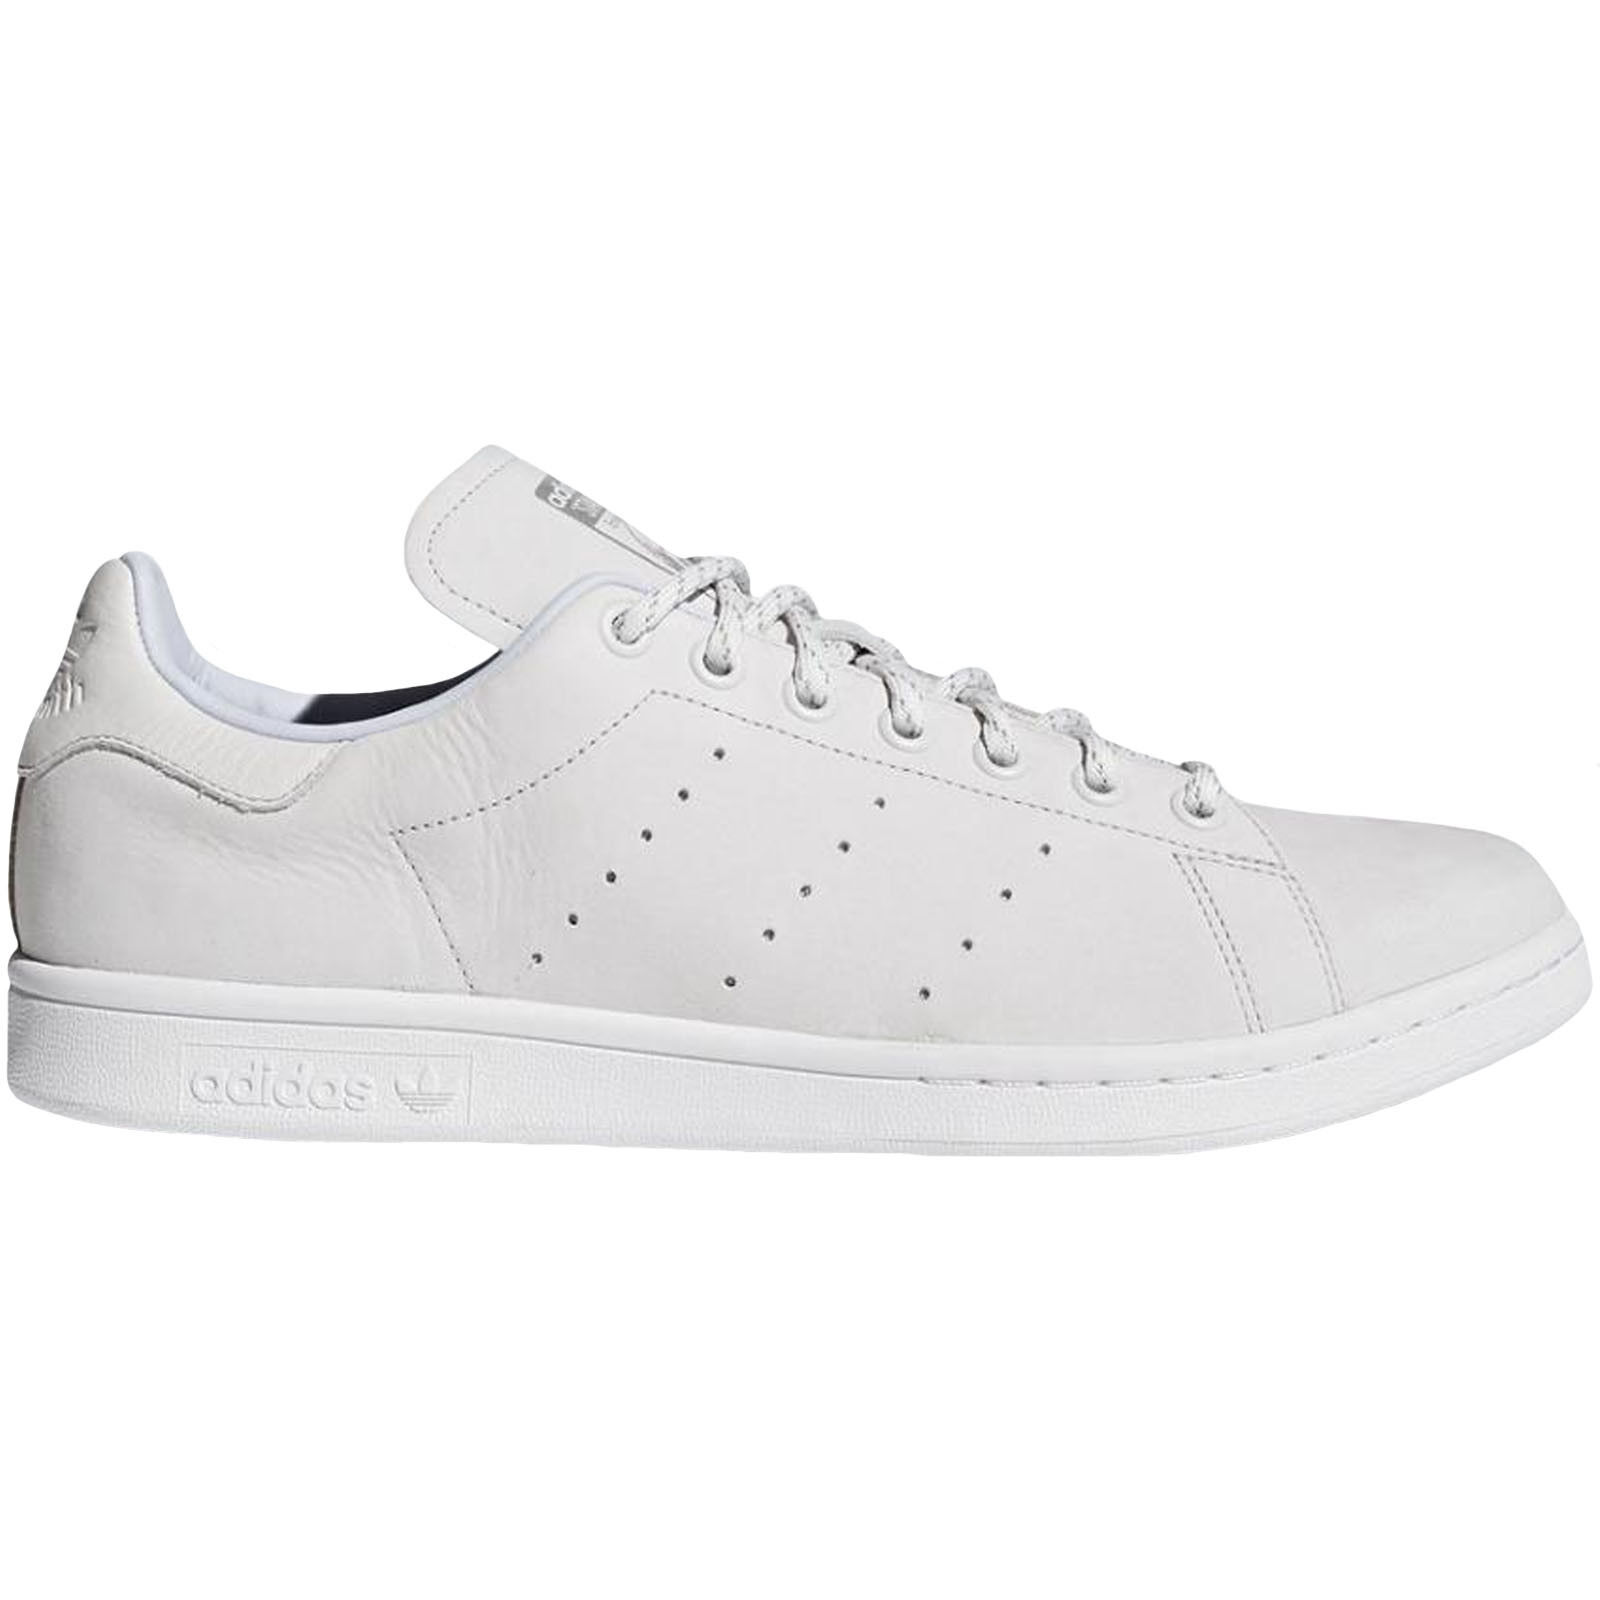 adidas Originals Herren Busenitz Vulc RX Skaterschuhe Weiß